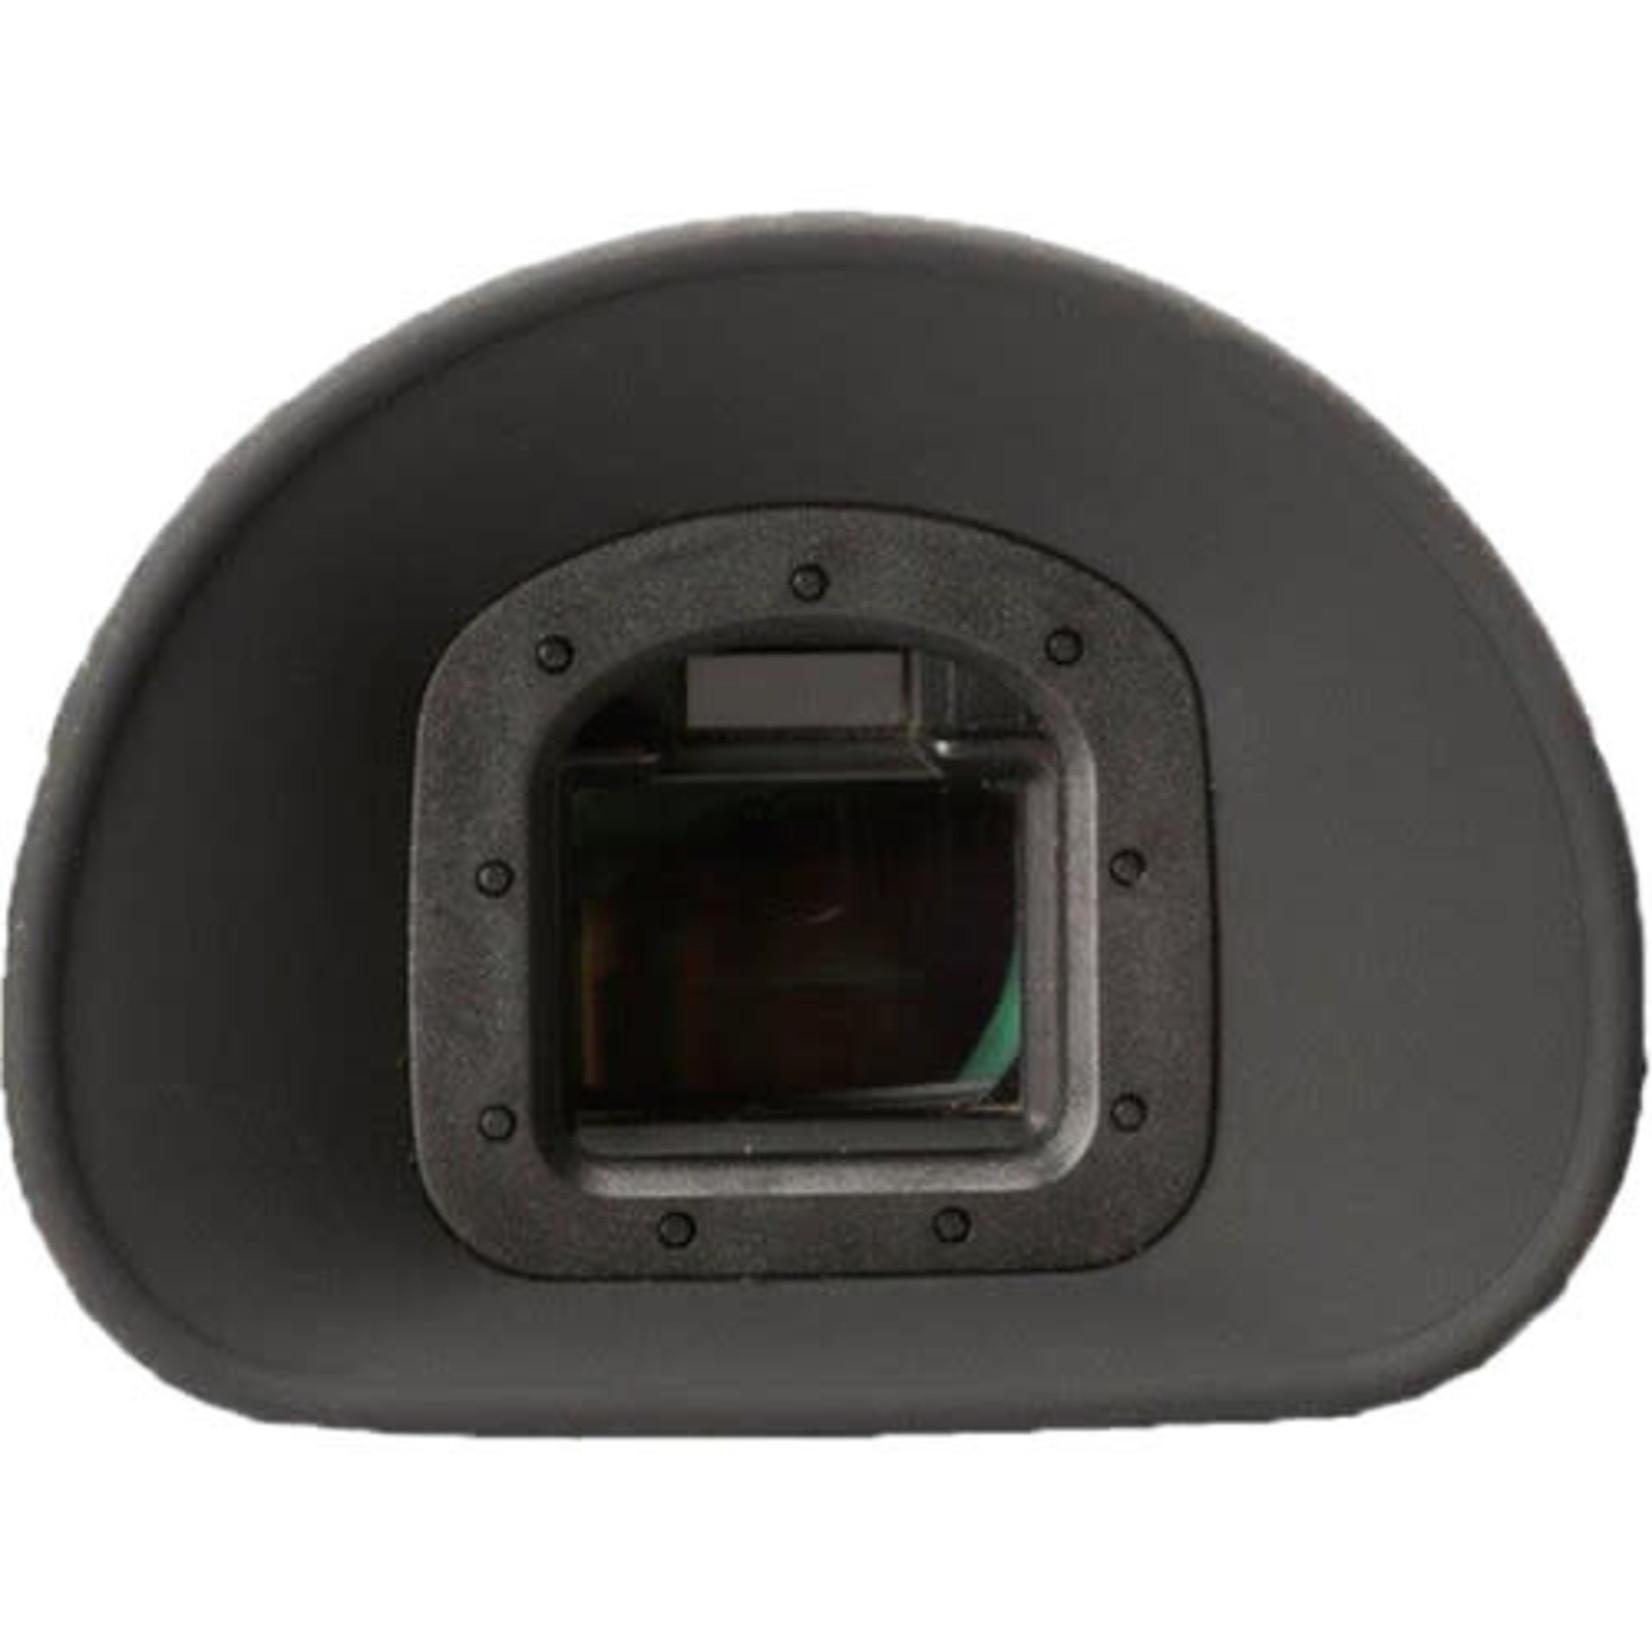 Hoodman HoodEYE Eyecup for Mirrorless Sony Series A7 & A9